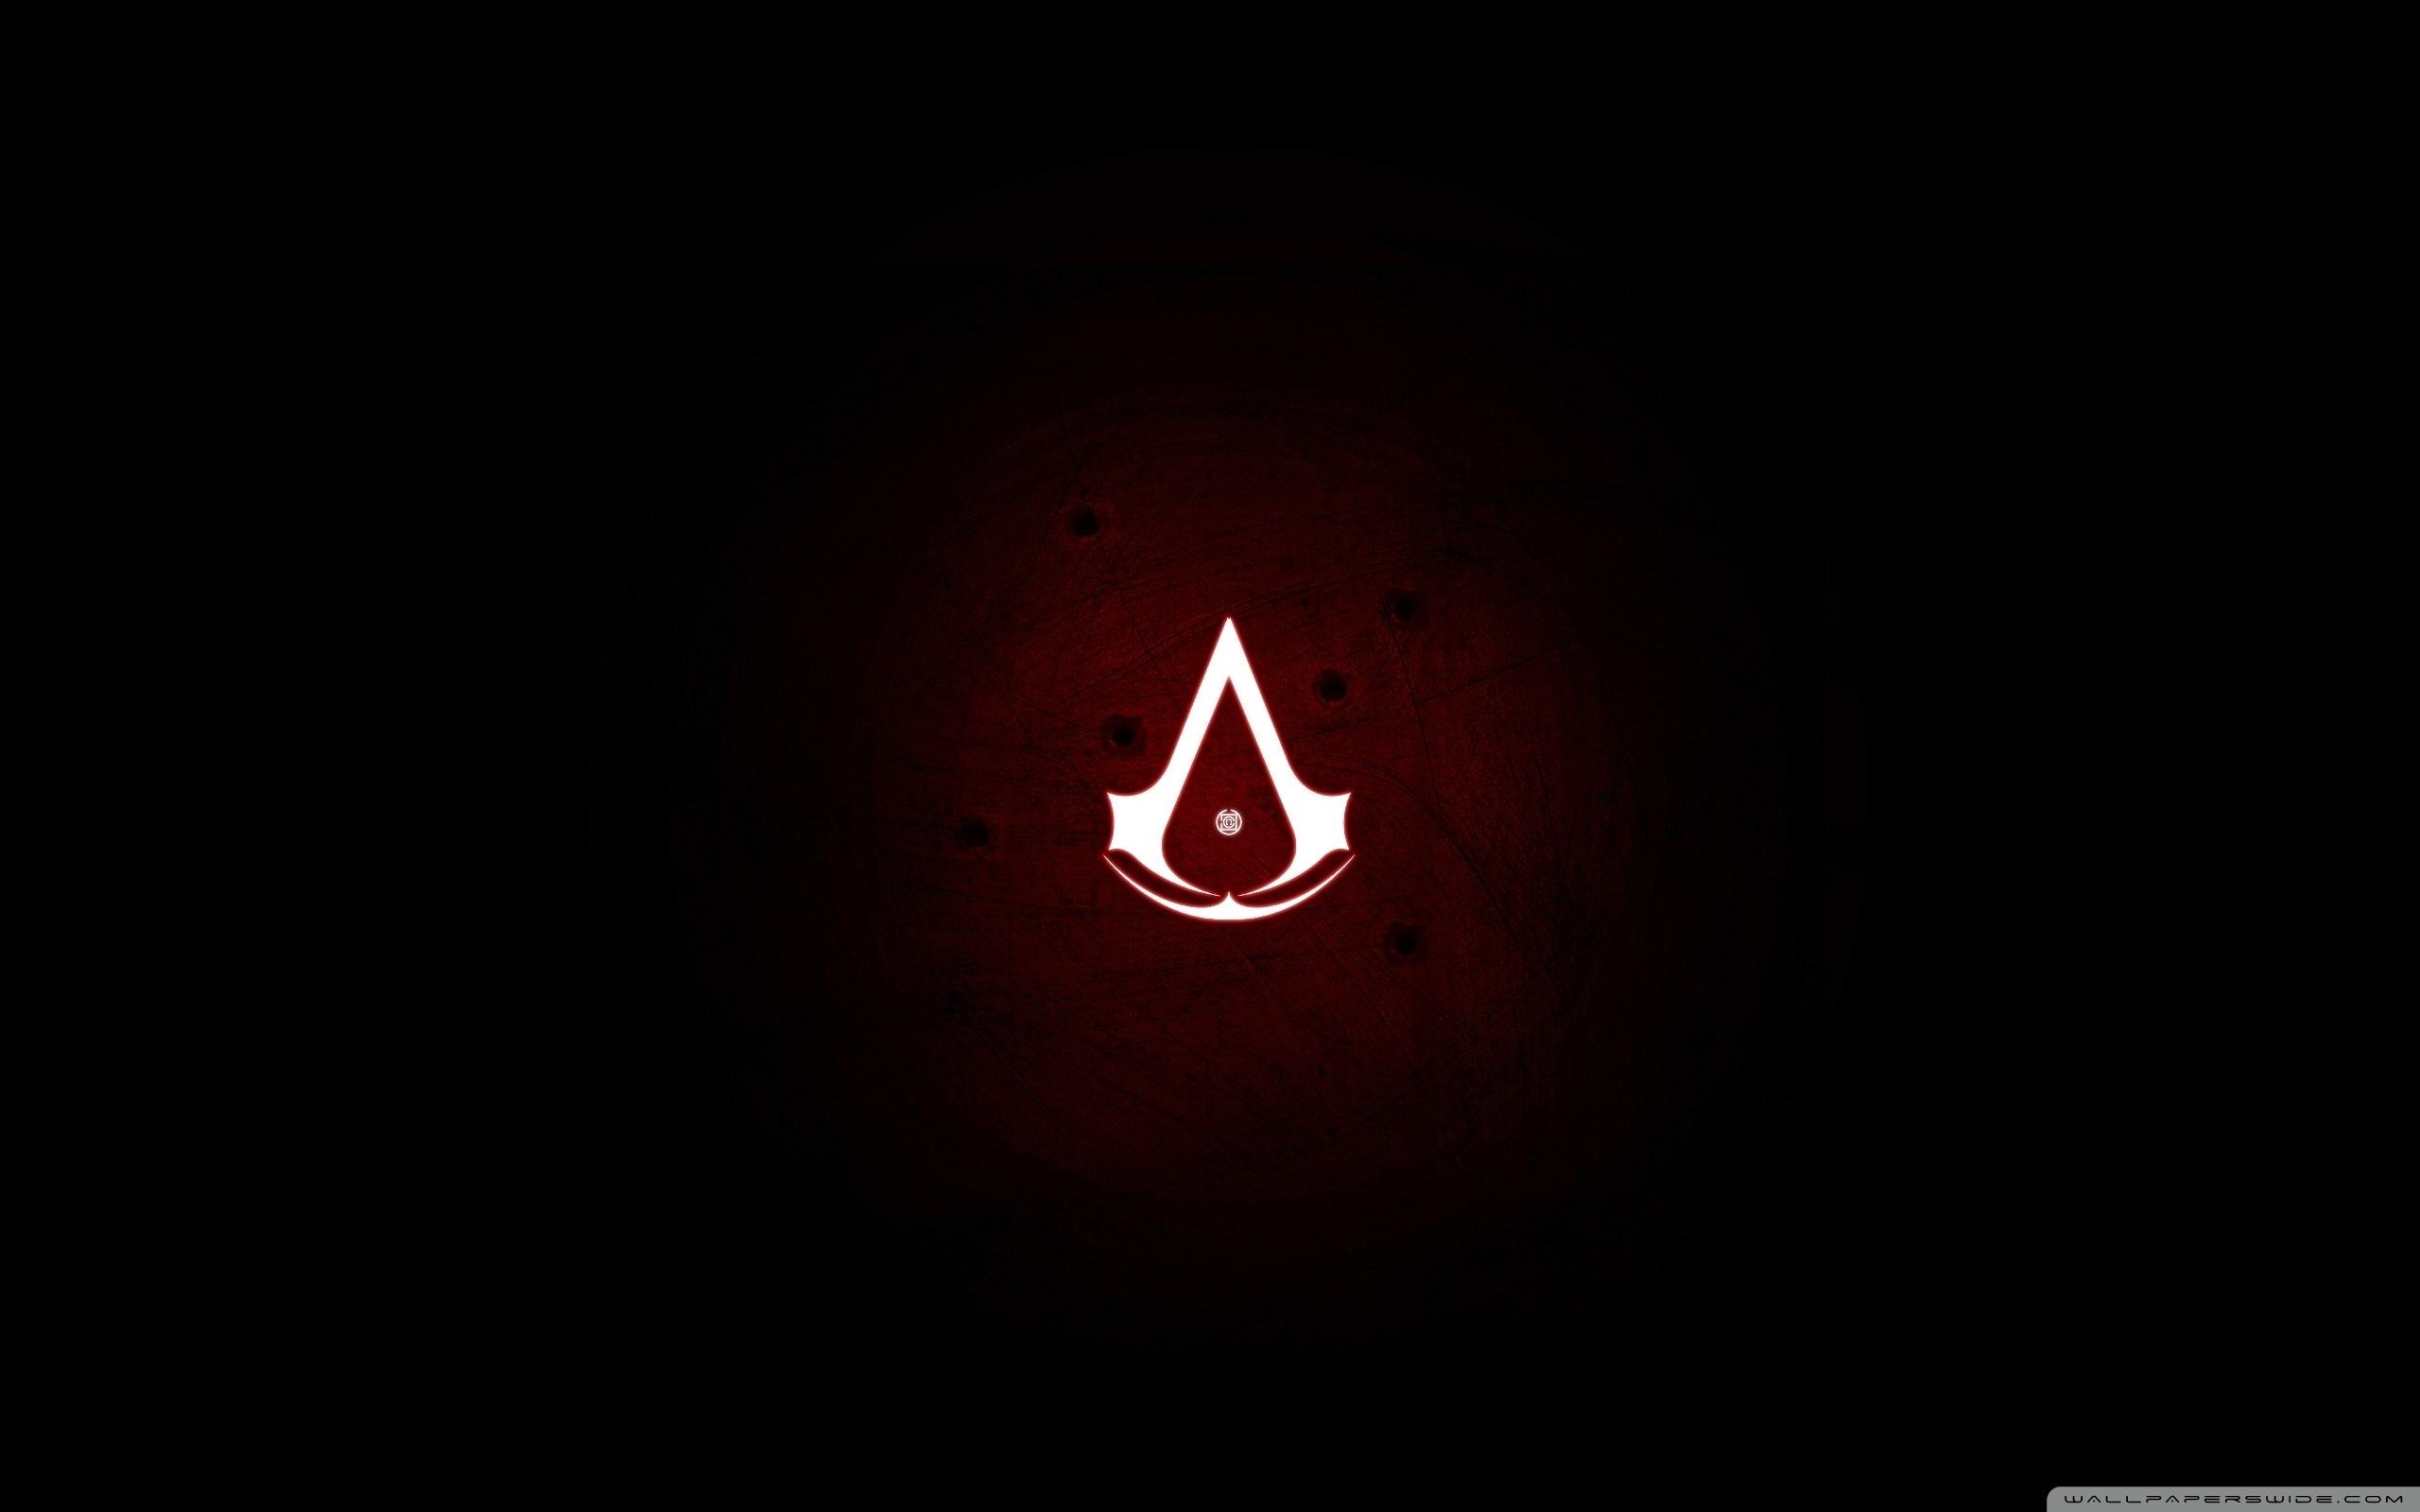 assassins creed revelations logo ❤ 4k hd desktop wallpaper for 4k